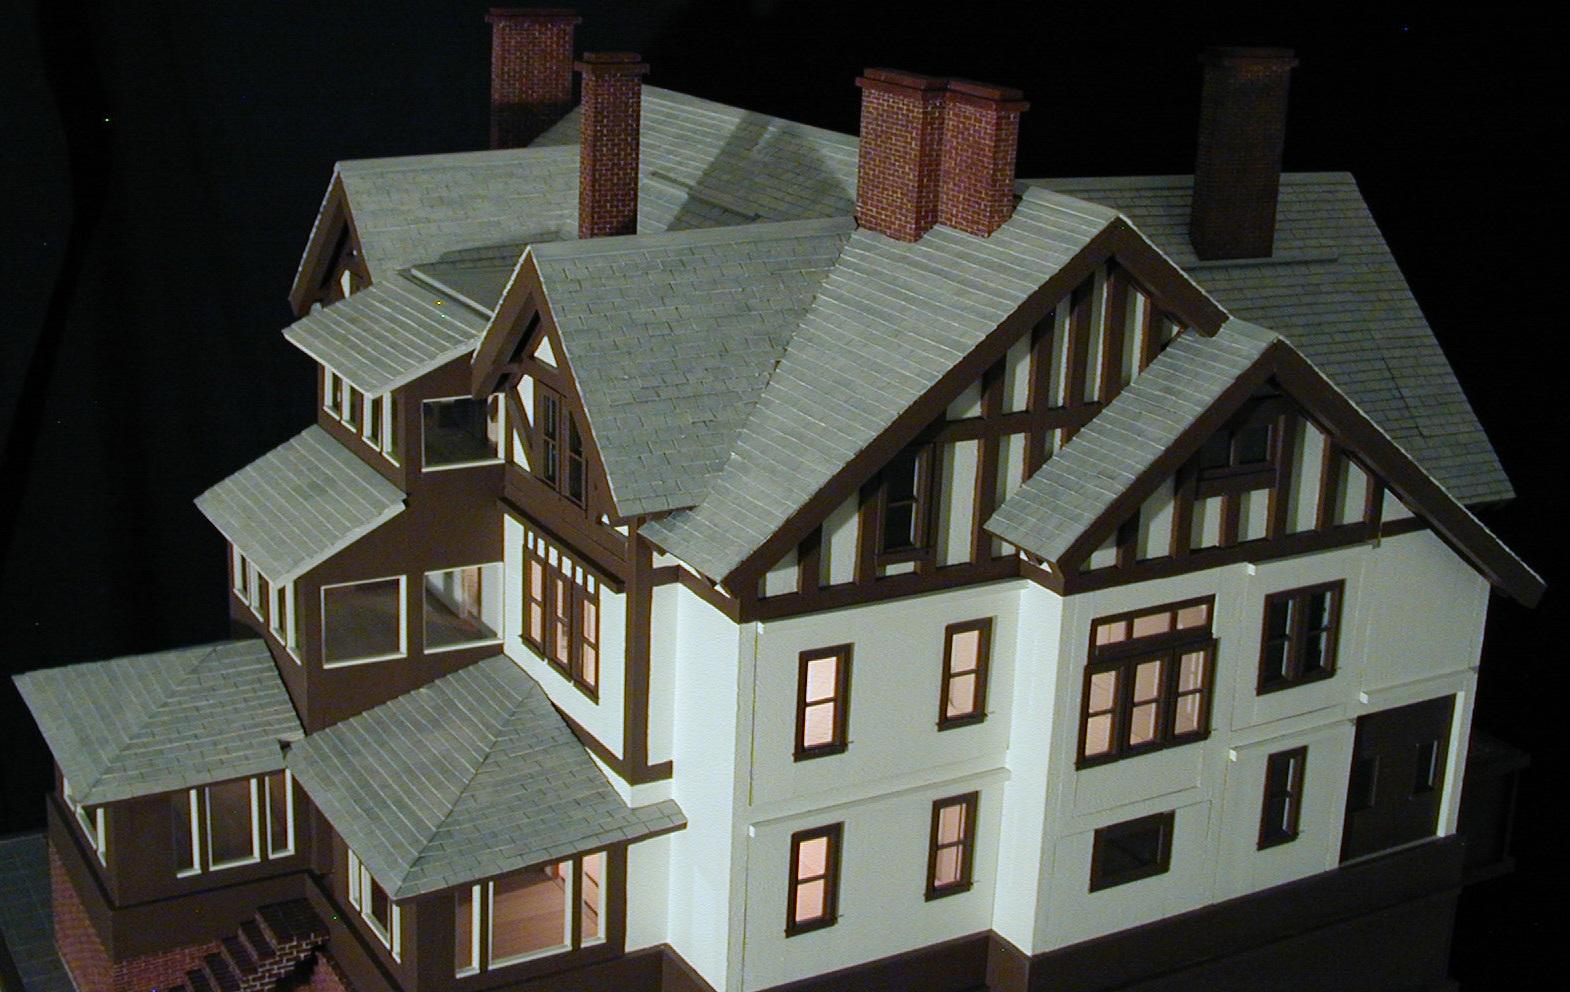 Six Bedrooms, Seven Bathrooms;  10,000 hand cut wood roof pieces